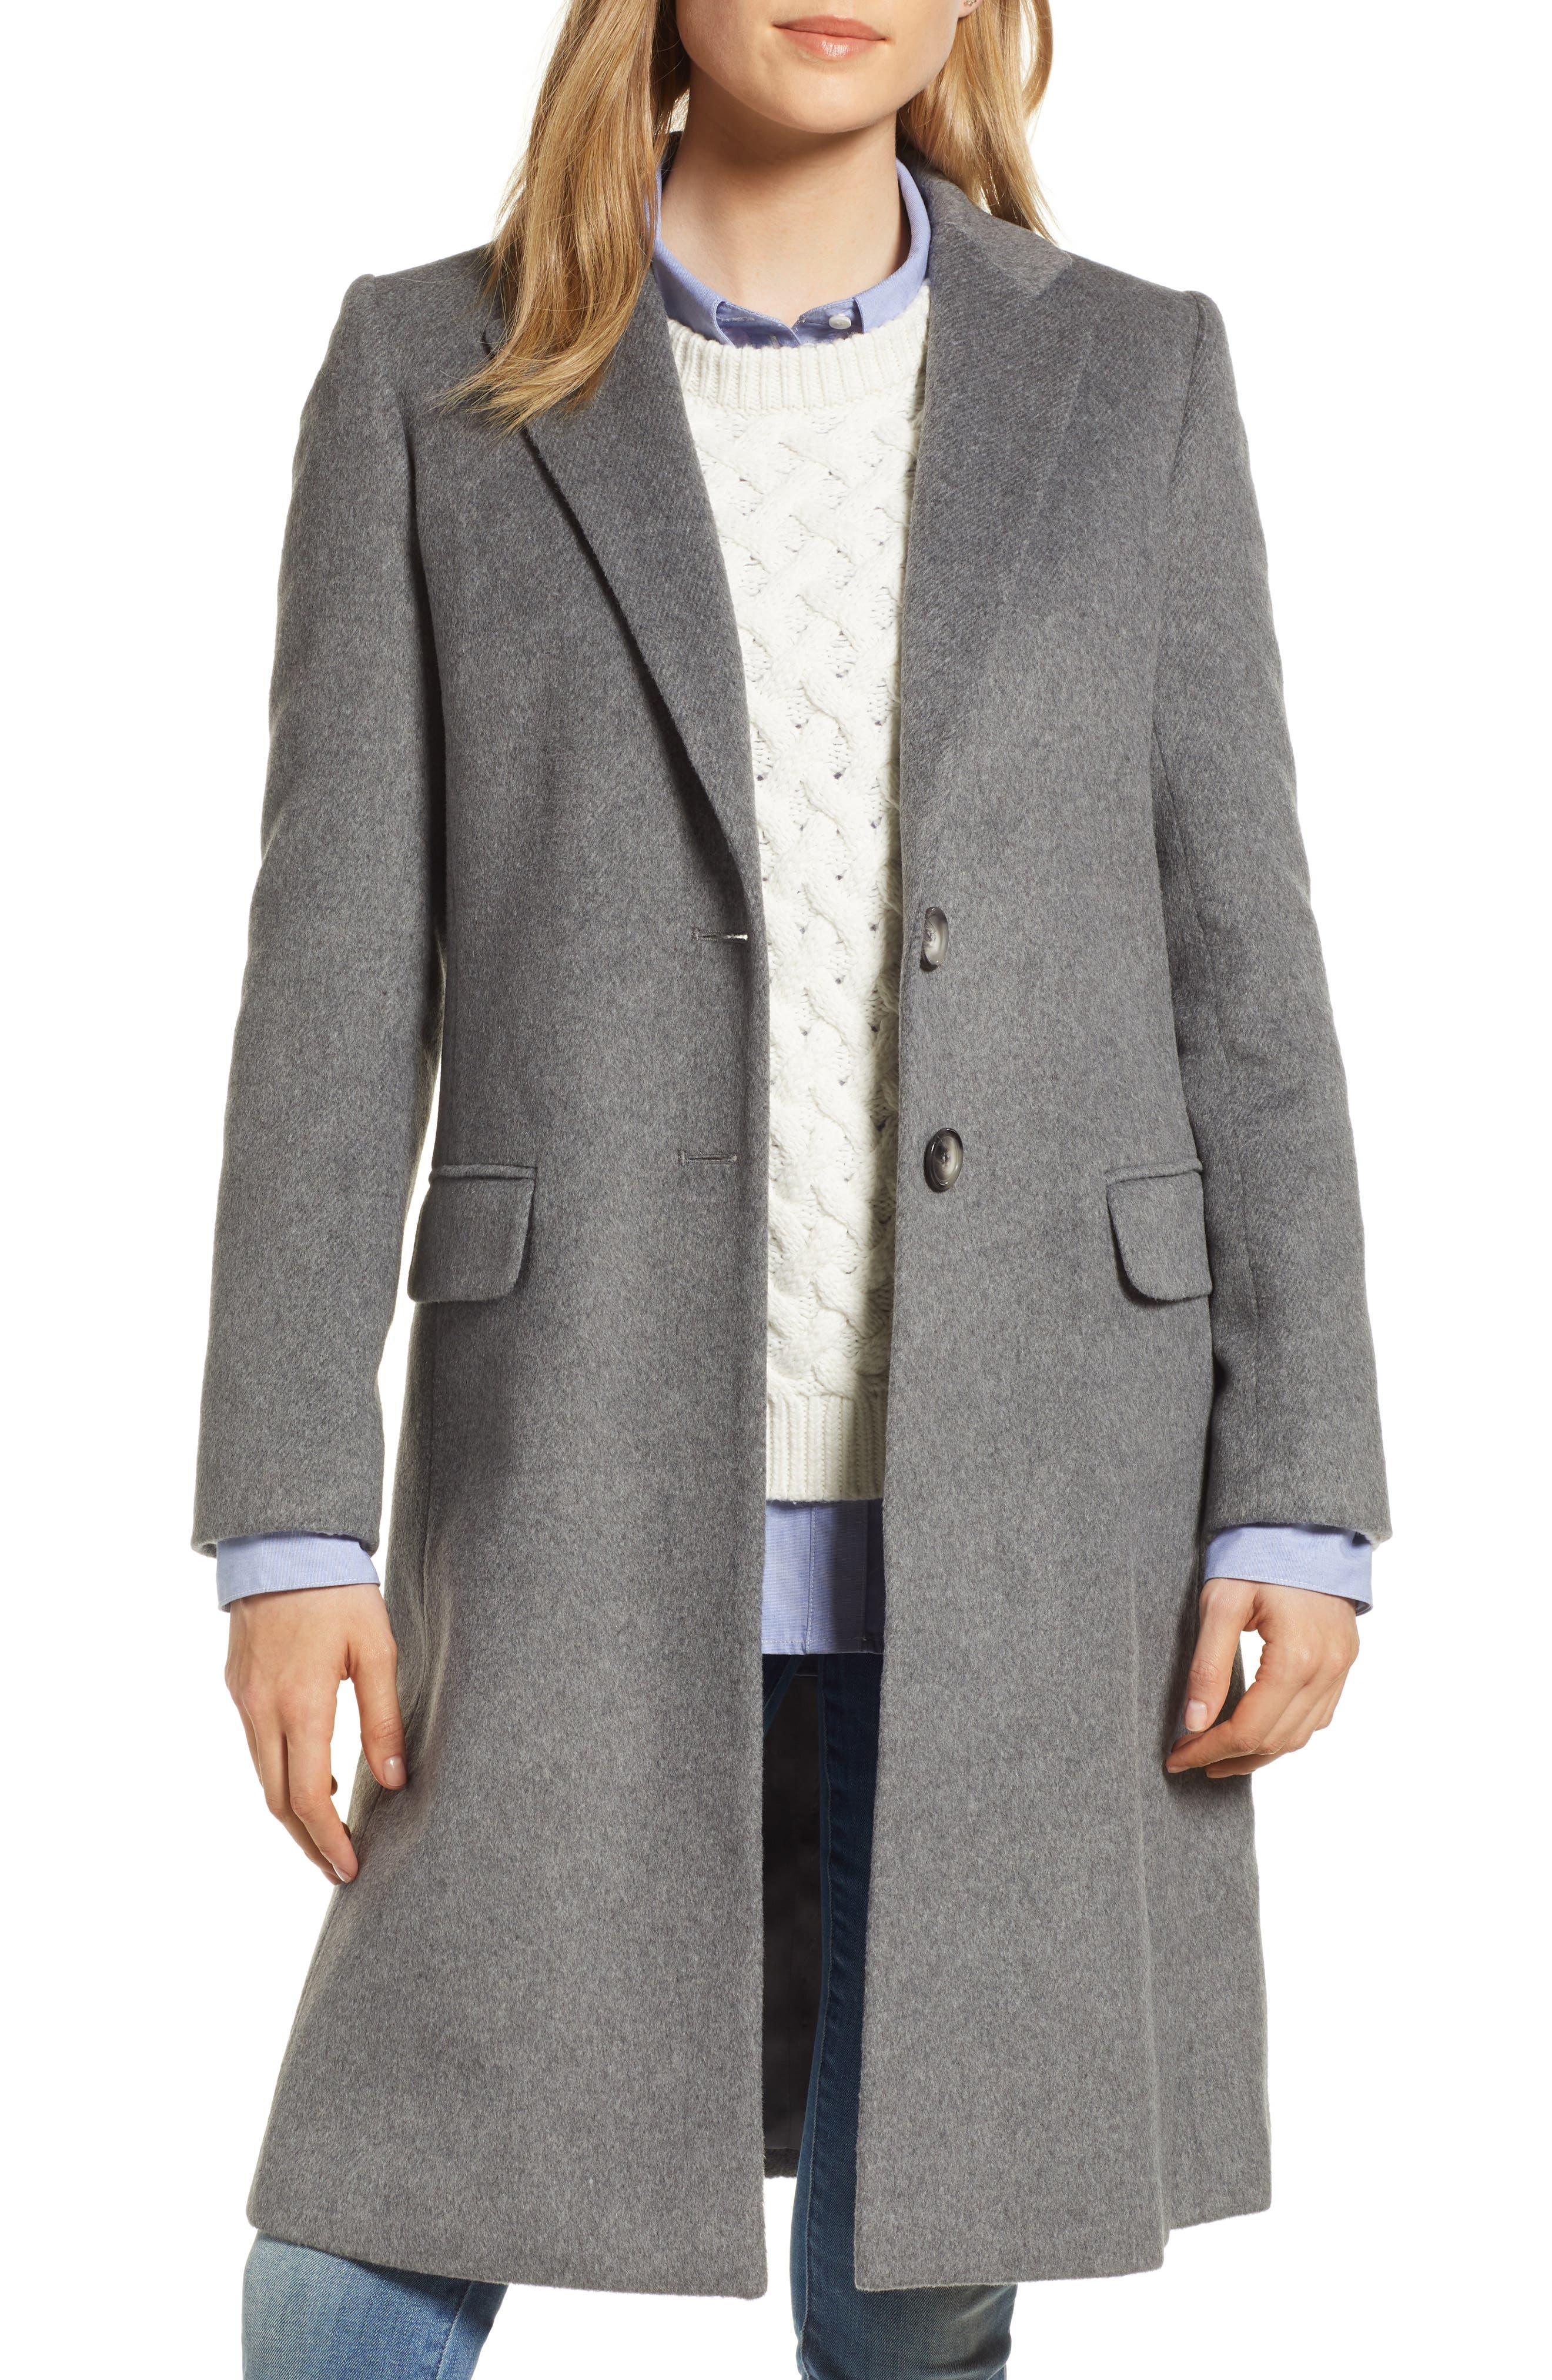 Charles Gray London College Coat,                             Main thumbnail 1, color,                             020